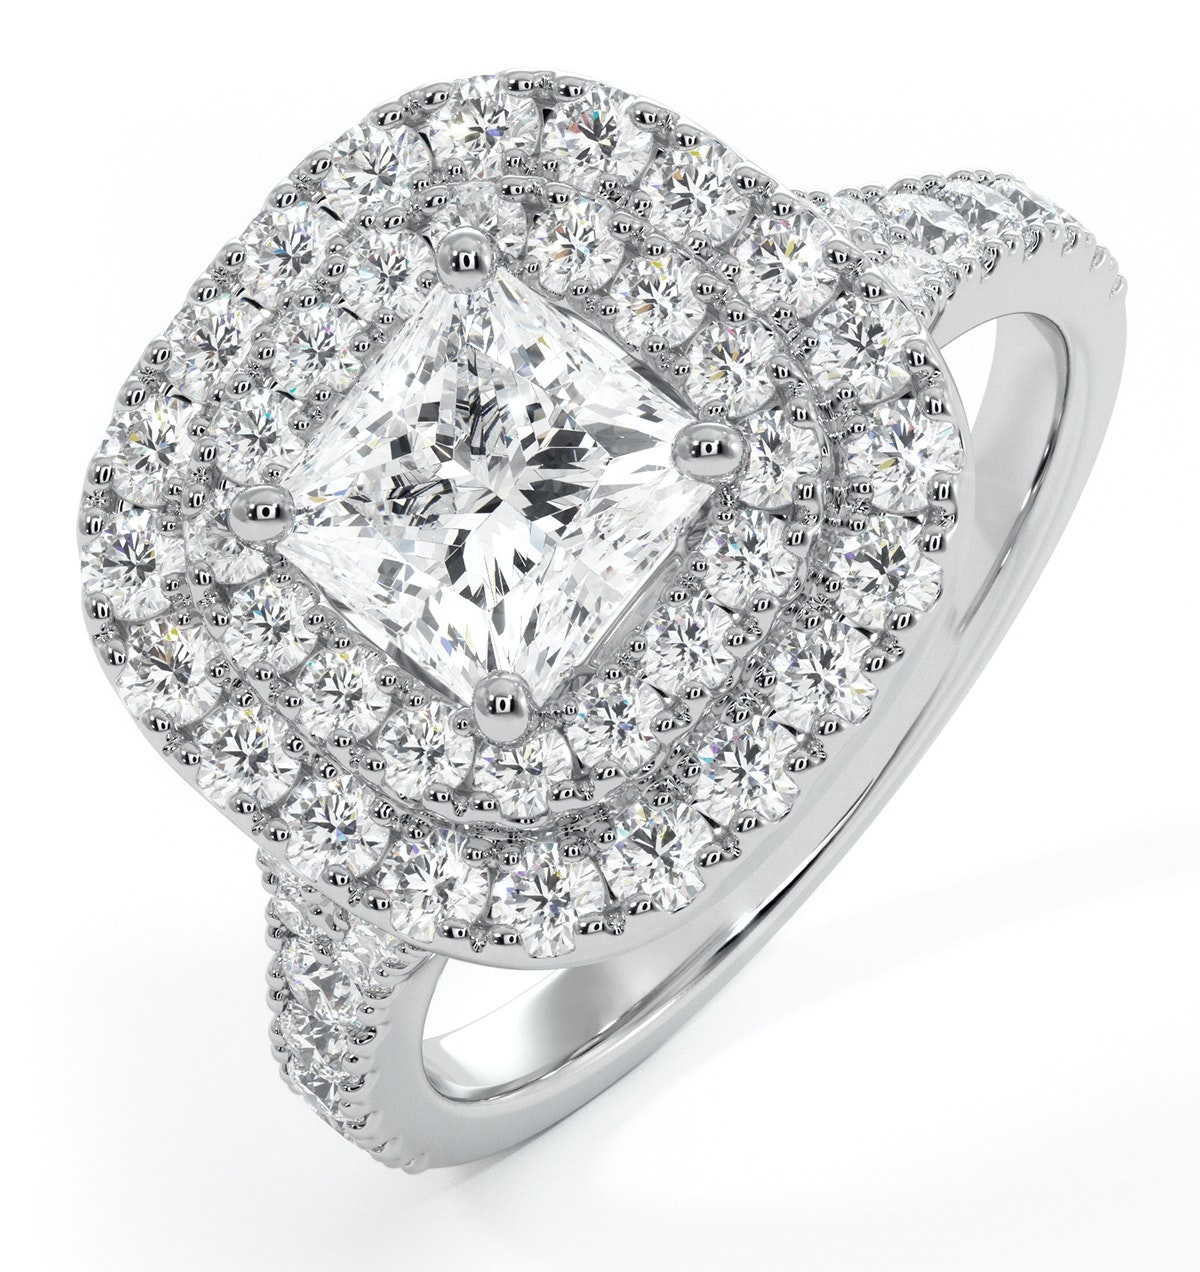 Cleopatra GIA Diamond Halo Engagement Ring in Platinum 1.70ct G/VS1